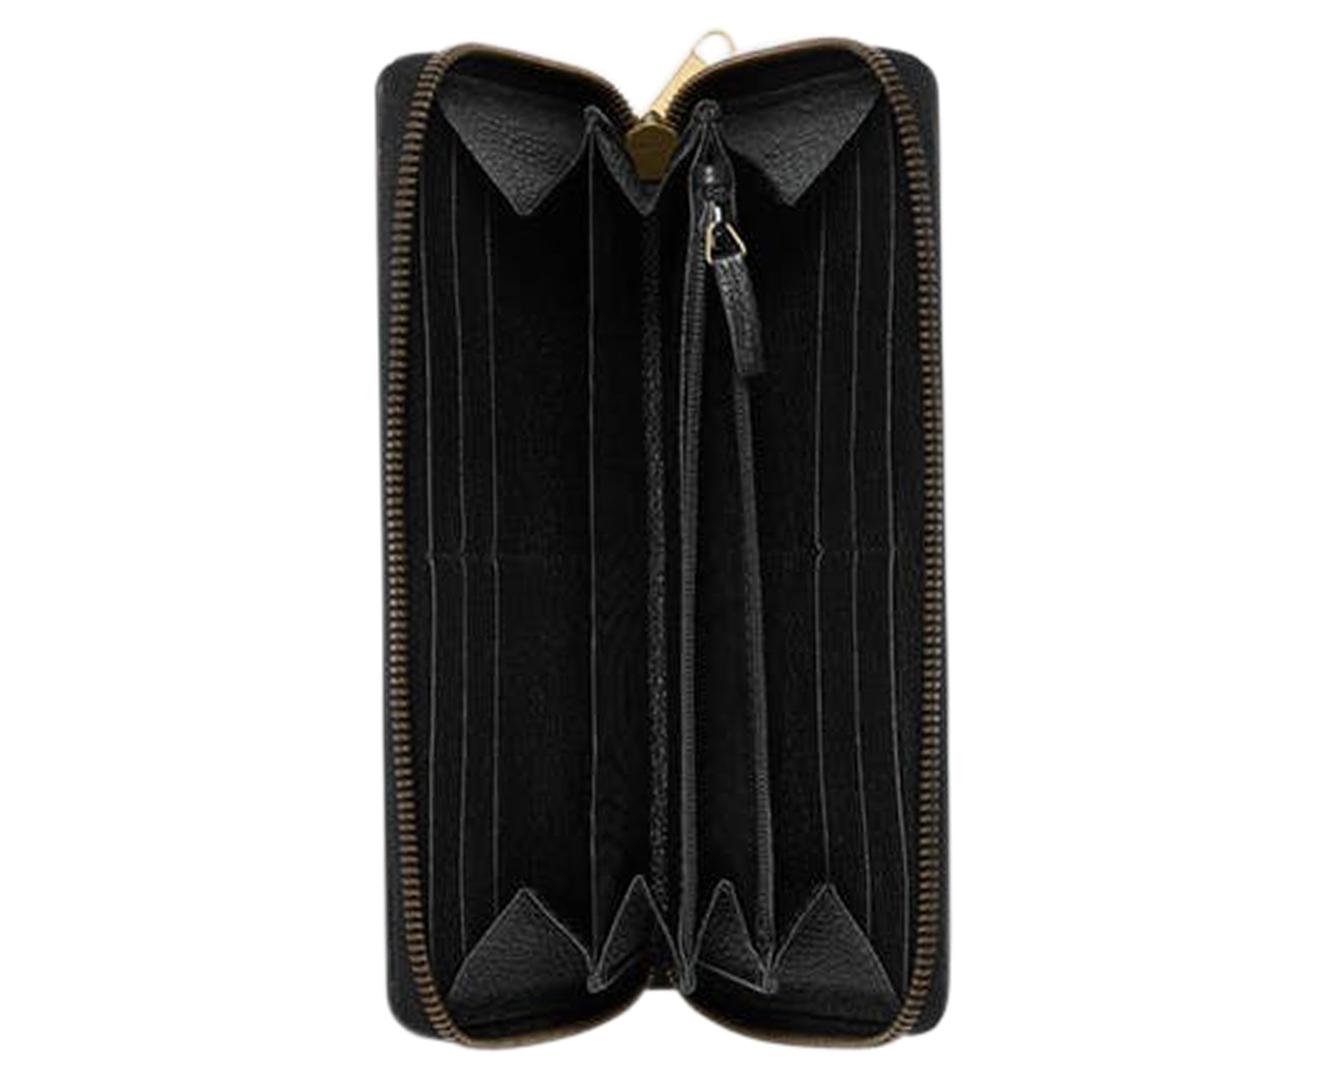 355c3f7d7d Details about Gucci Women's Print Leather Zip-Around Wallet - Black